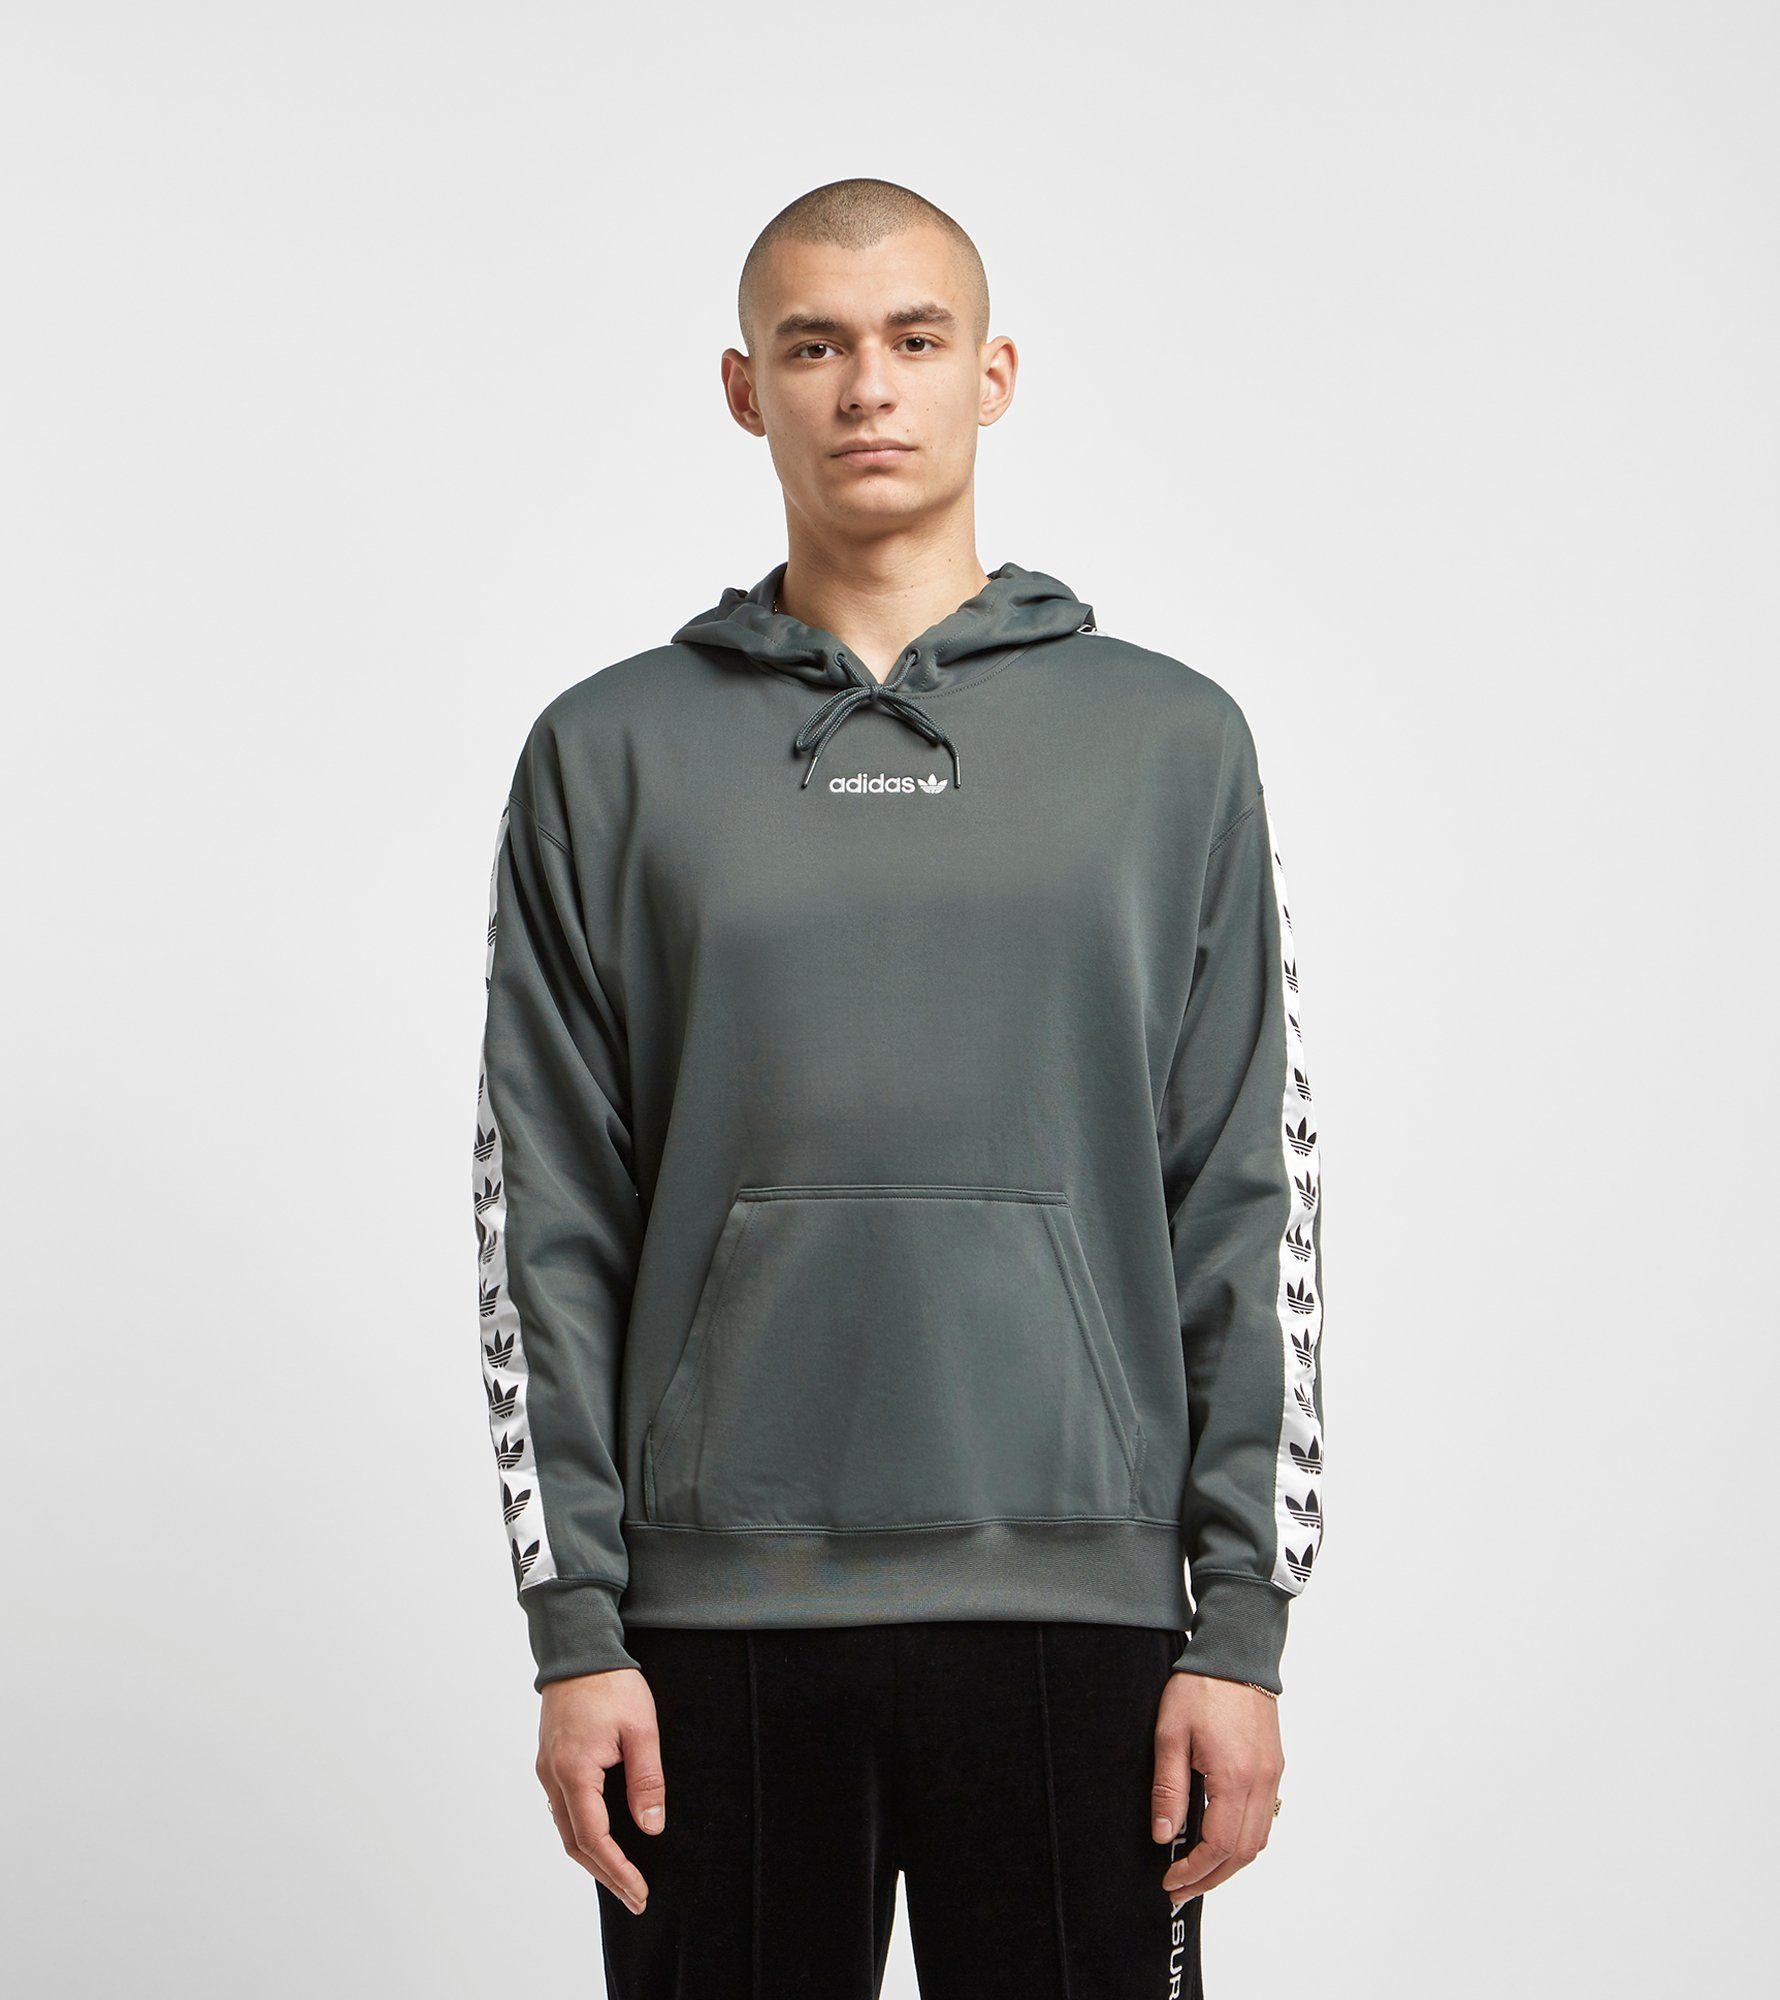 adidas Originals TNT Overhead Tape Huvtröja size?exclusive | Size?